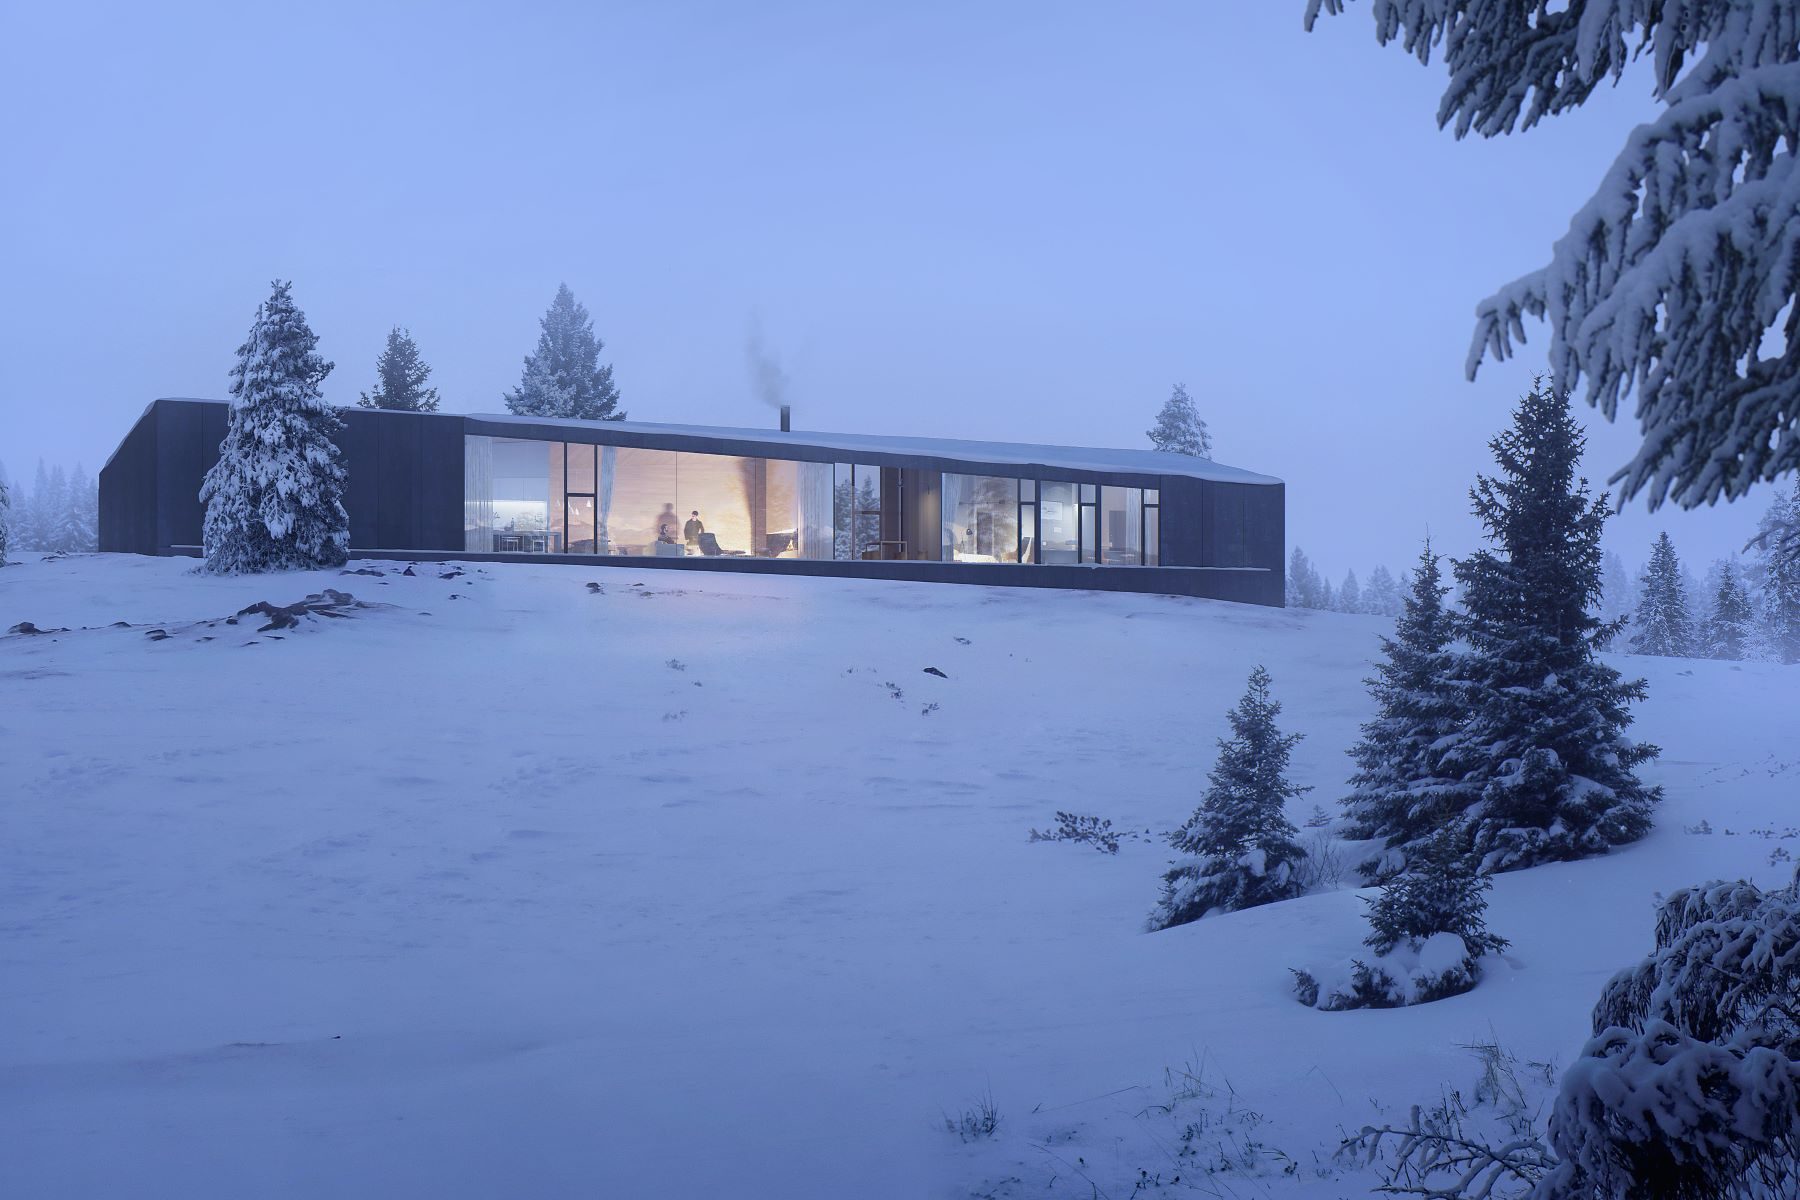 獨棟家庭住宅 為 出售 在 I House at Carraig Ridge 38 Carraig Ridge, Ghost Lake, 阿爾伯塔, T0L 1N0 加拿大